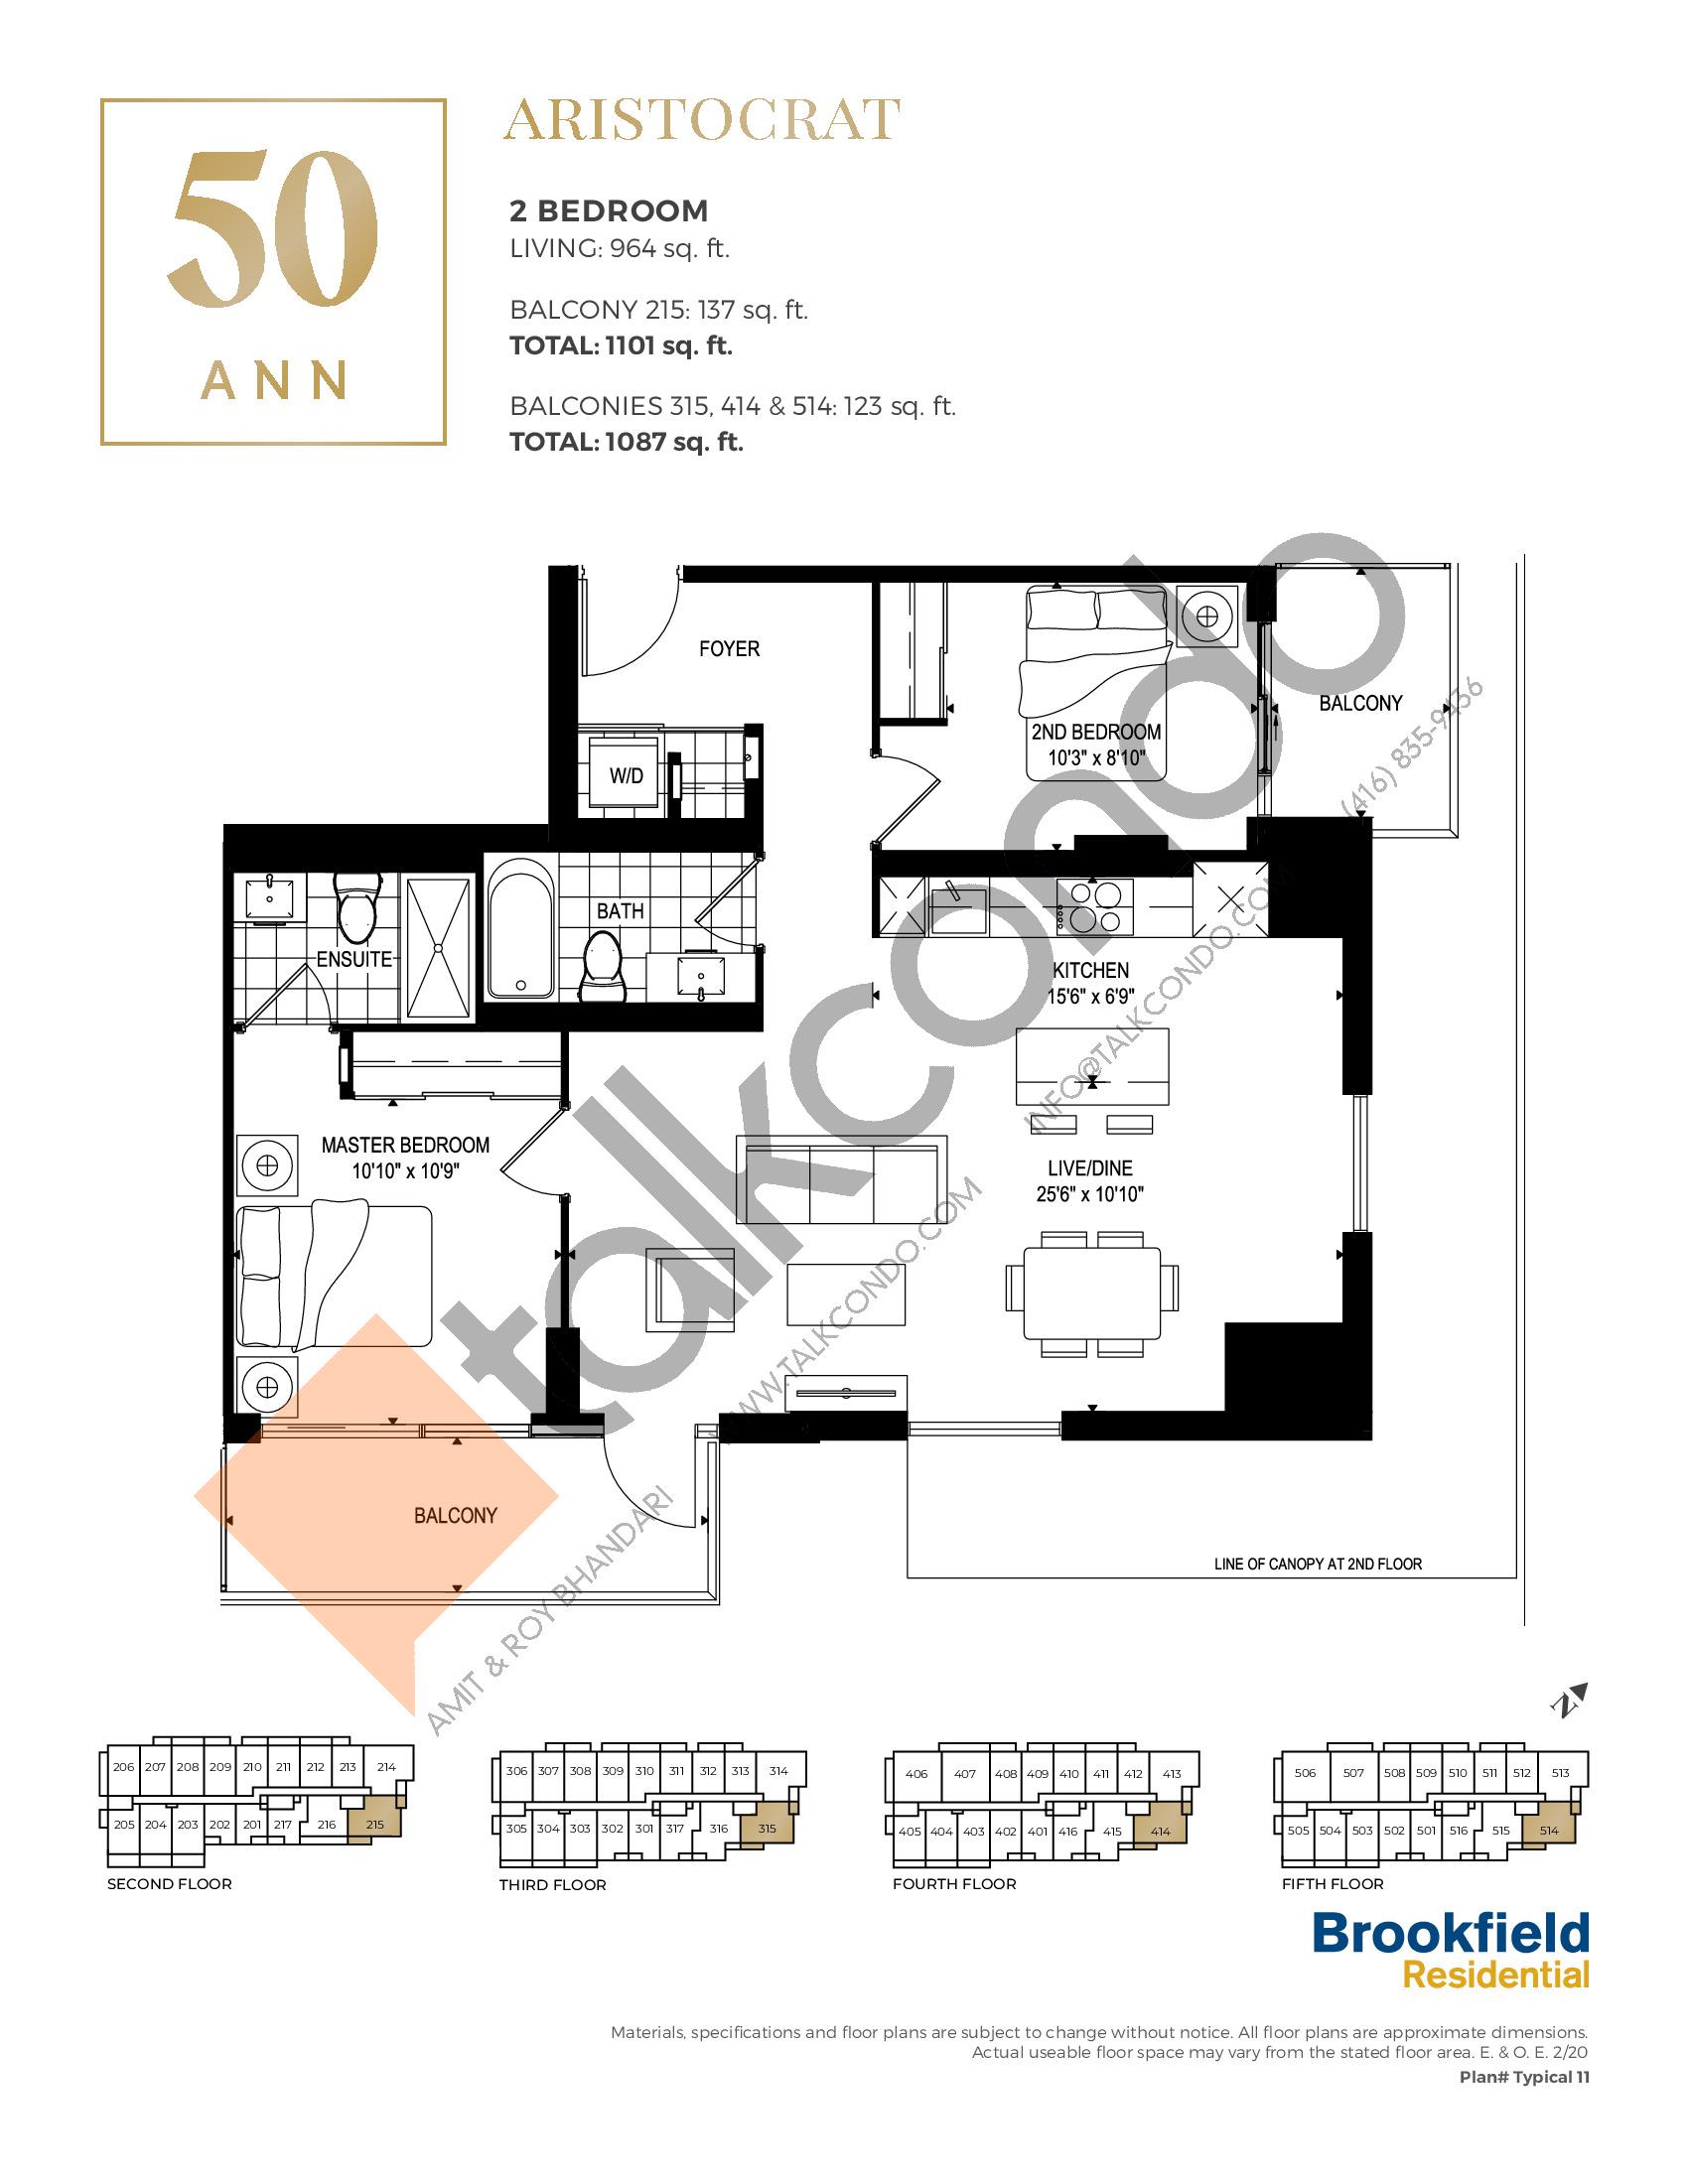 Aristocrat Floor Plan at 50 Ann Condos - 964 sq.ft